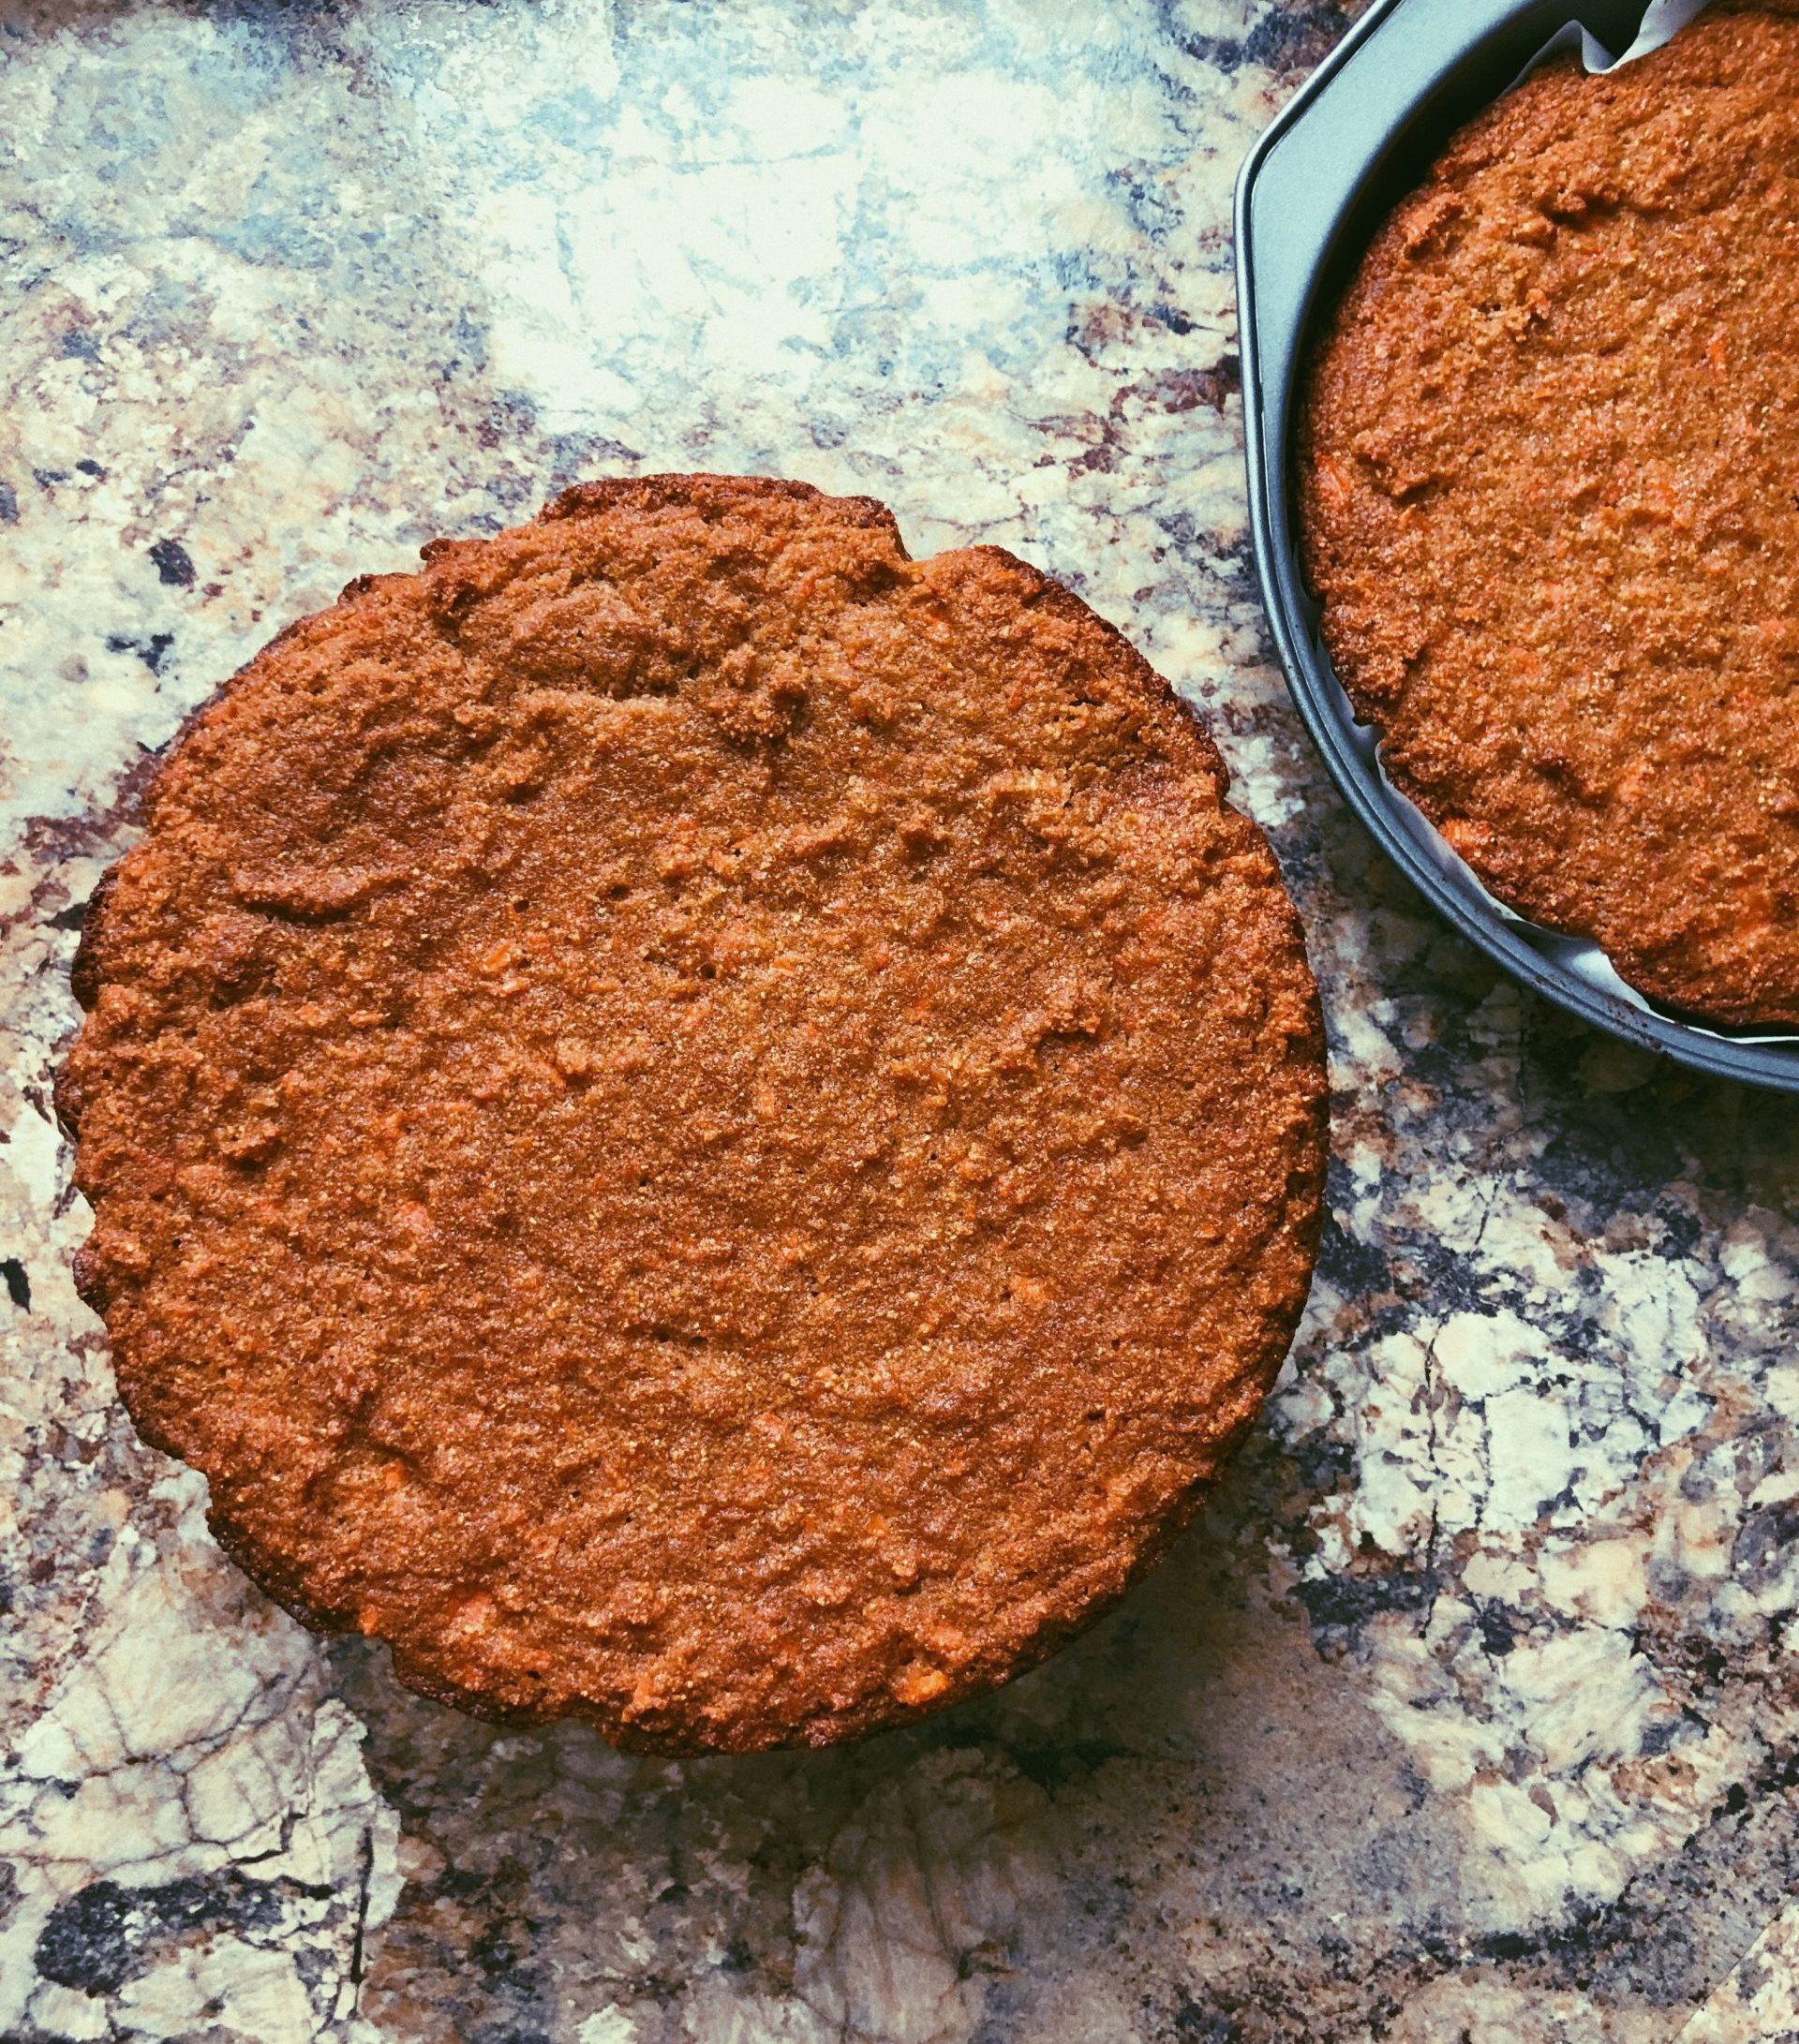 grain free scd legal carrot cake